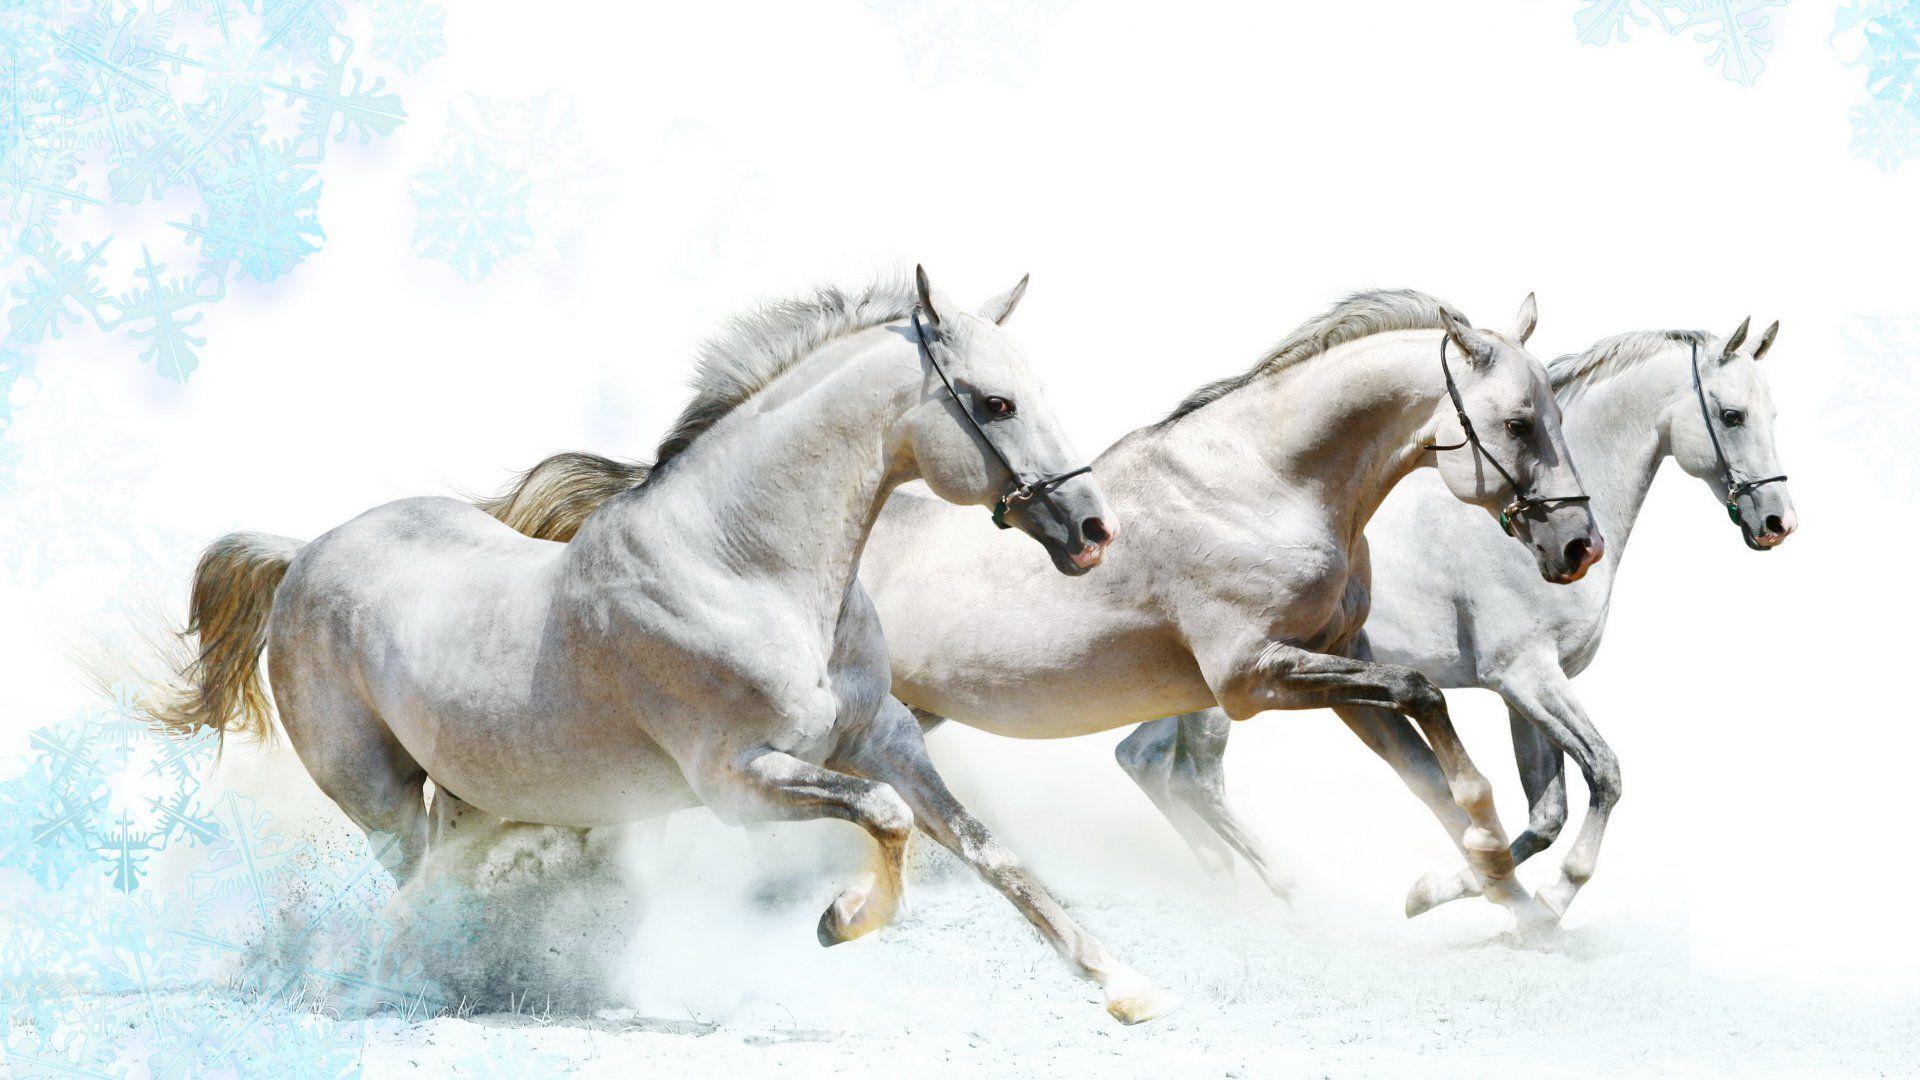 White Horses 2021 Live Wallpaper Hd Horse Wallpaper White Horses Horses